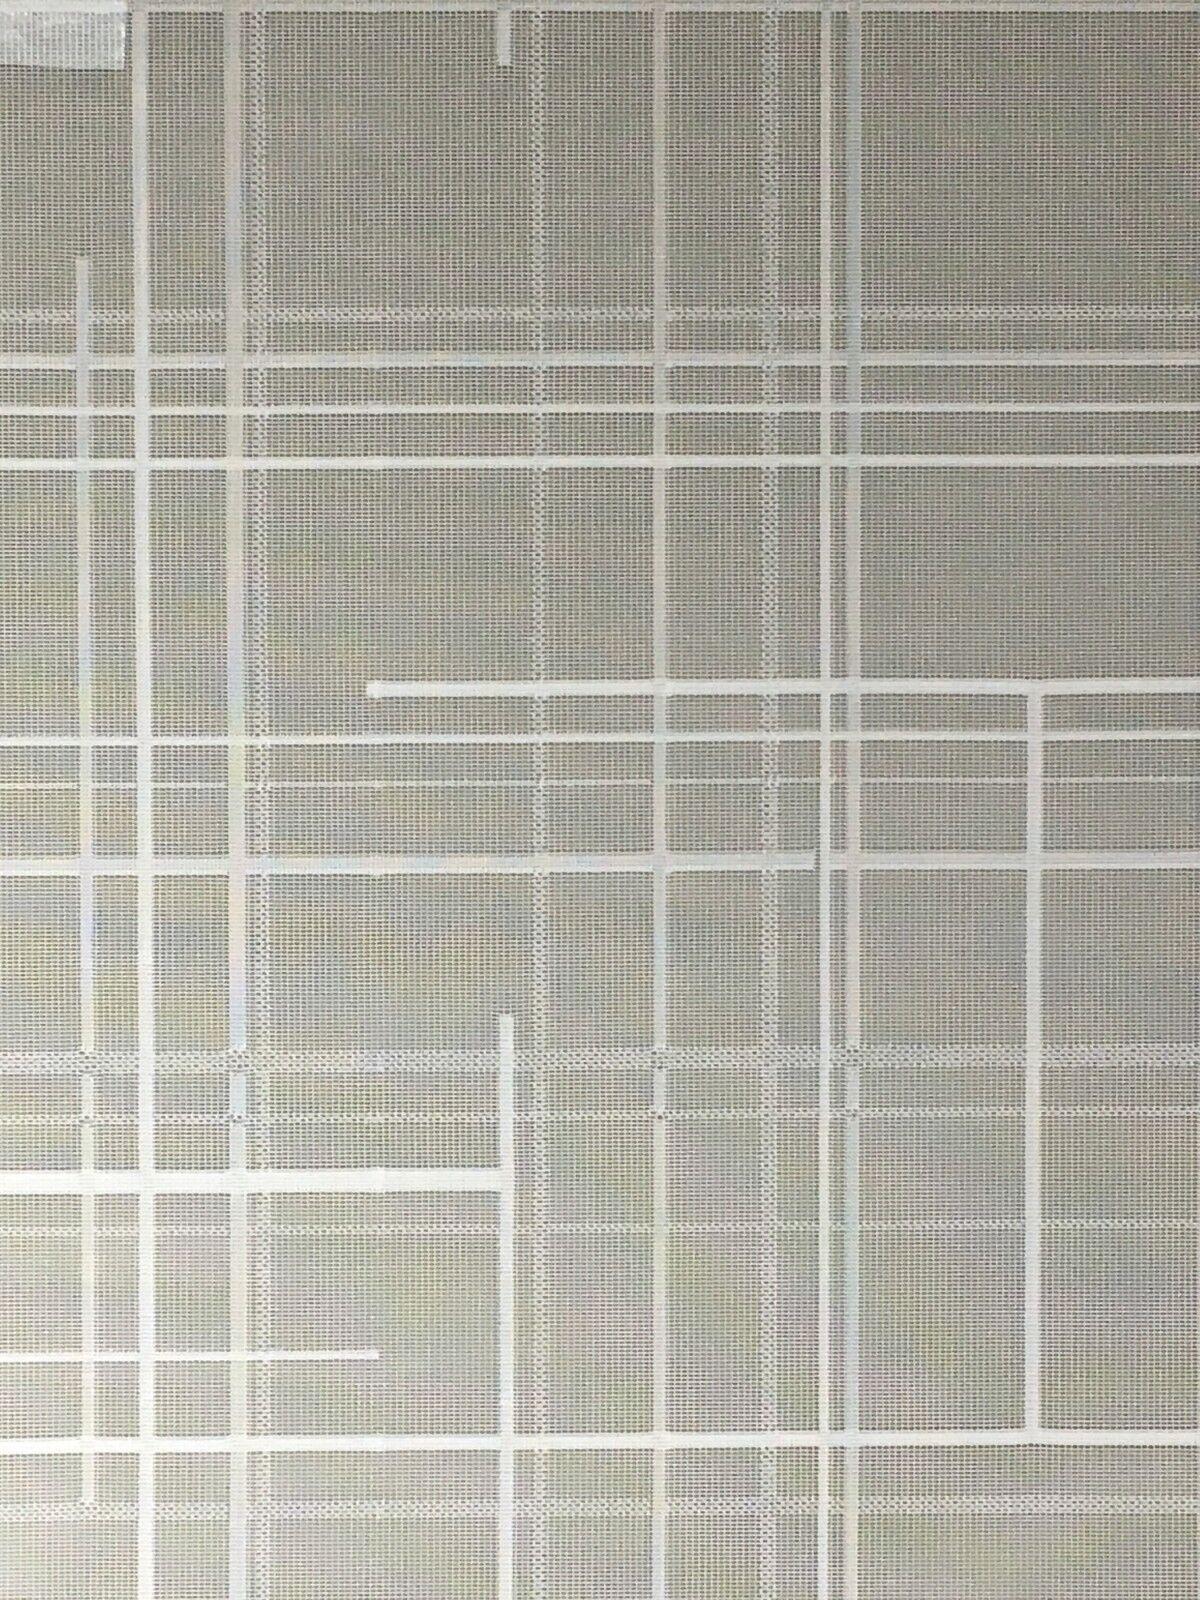 Maßanfertigung Doppelstoff Rollo Tül Tül Tül Stor Perde Doppelrollo Weiß Creme Plissee | Offizielle  d3ab2d